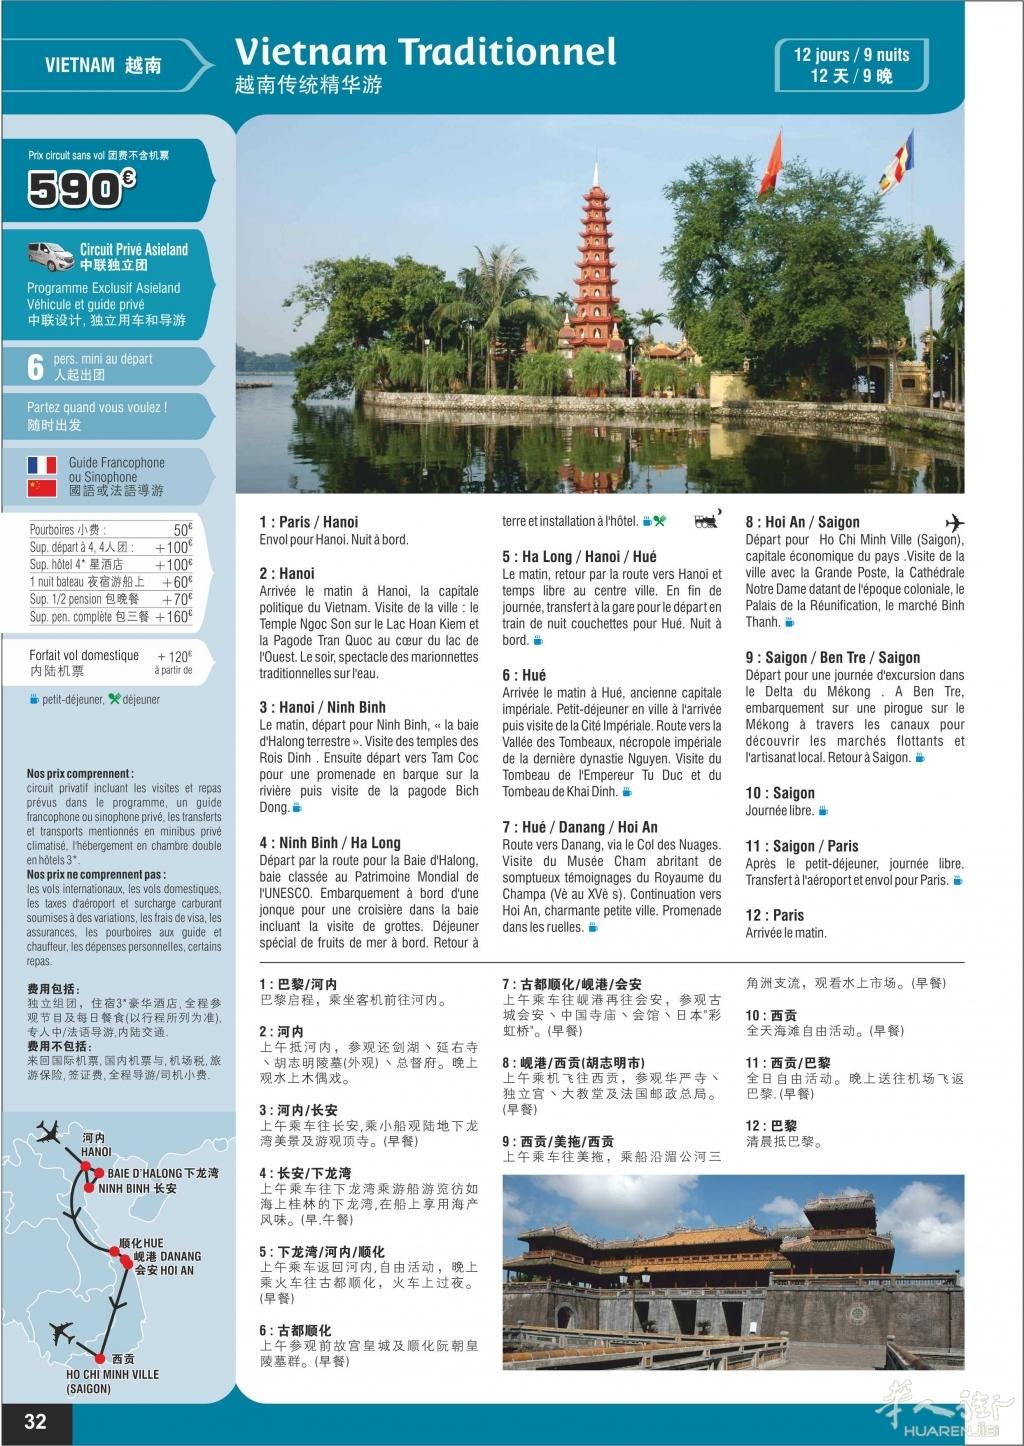 p32-Vietnam Traditionnel-12j-v06.jpg